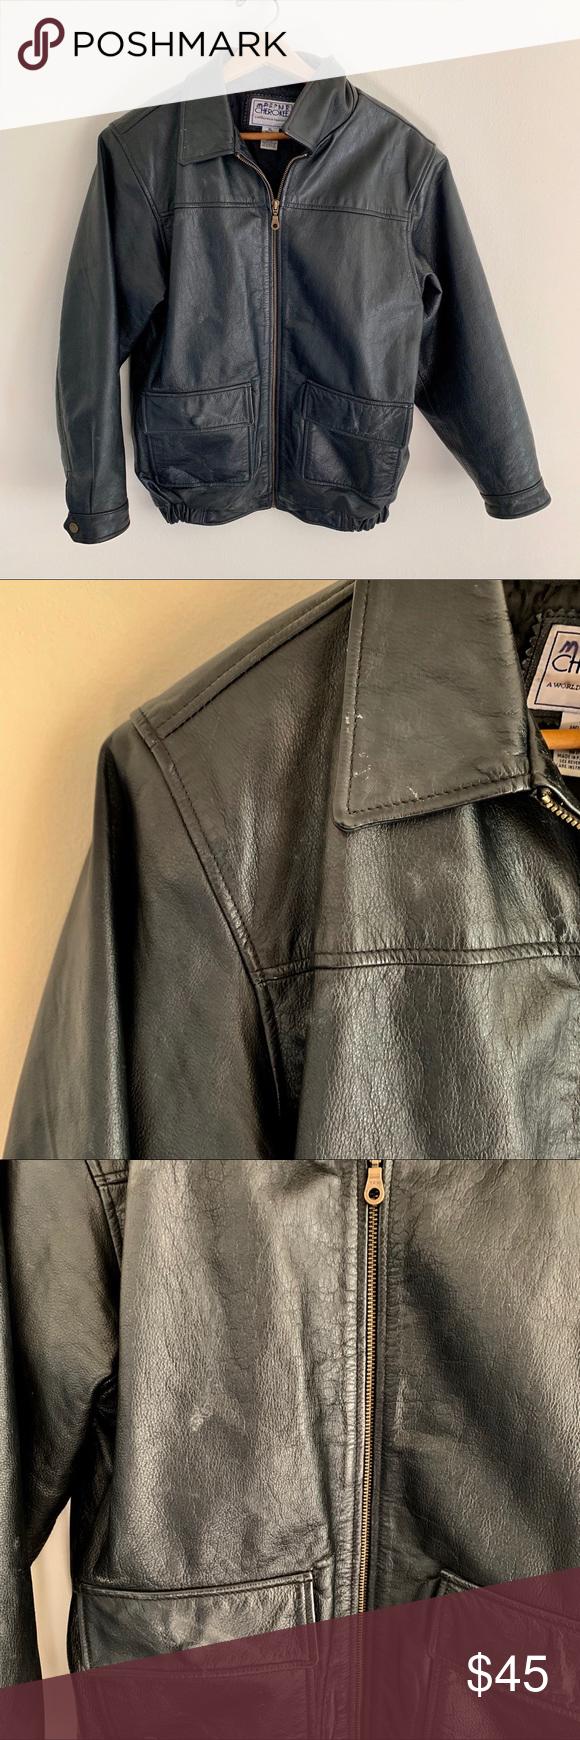 Cherokee Leather Jacket Leather Jacket Clothes Design Fashion [ 1740 x 580 Pixel ]